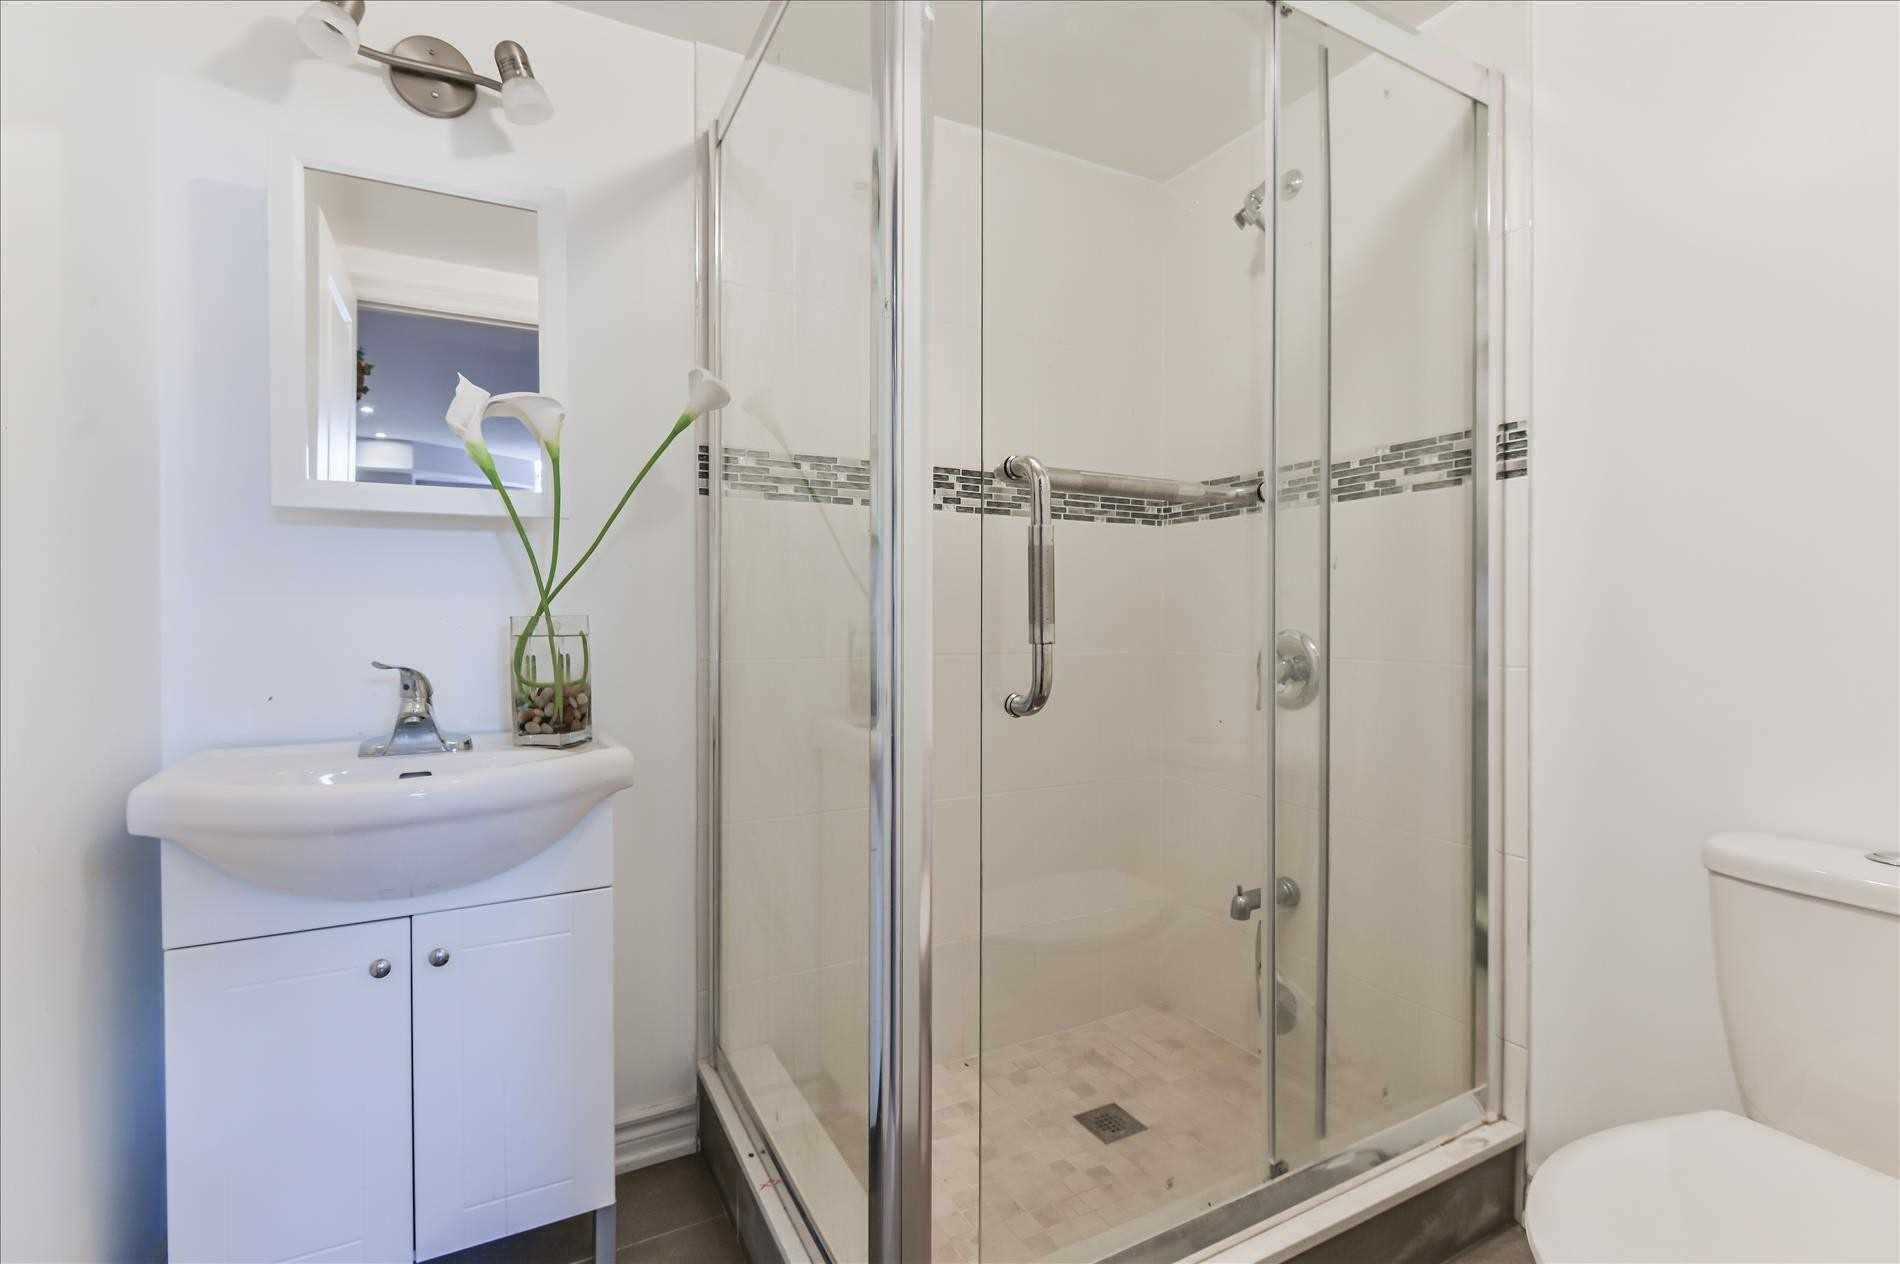 61 Village Pkwy, Markham, Ontario L3R4Z7, 3 Bedrooms Bedrooms, 7 Rooms Rooms,5 BathroomsBathrooms,Att/Row/Twnhouse,For Sale,Village,N5354815